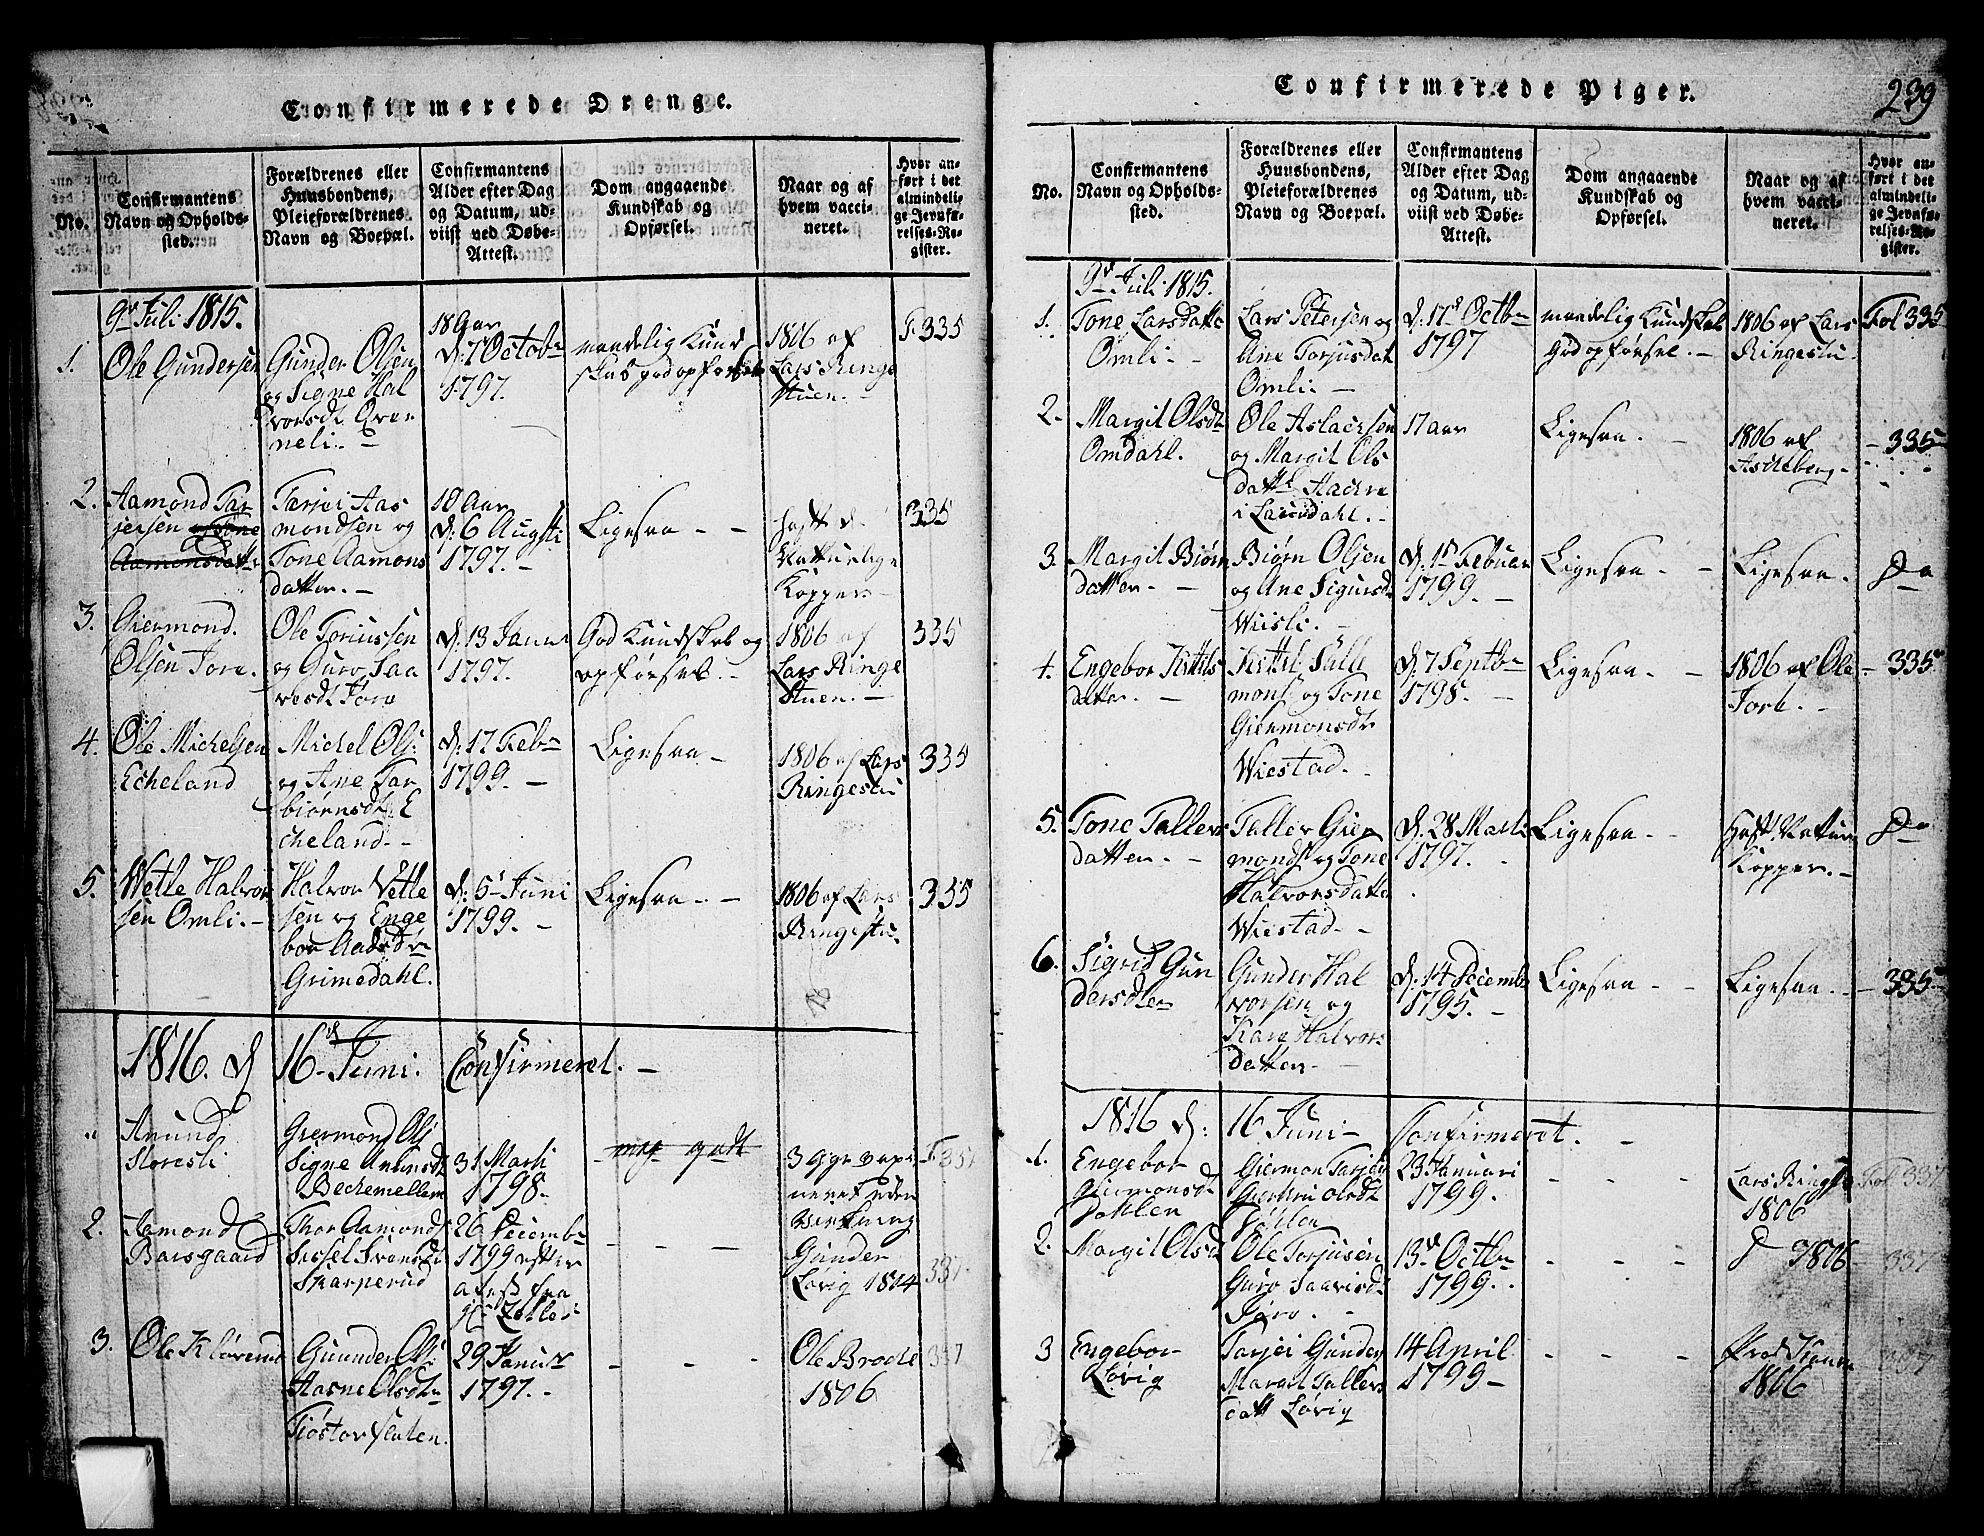 SAKO, Mo kirkebøker, G/Gb/L0001: Klokkerbok nr. II 1, 1814-1843, s. 239